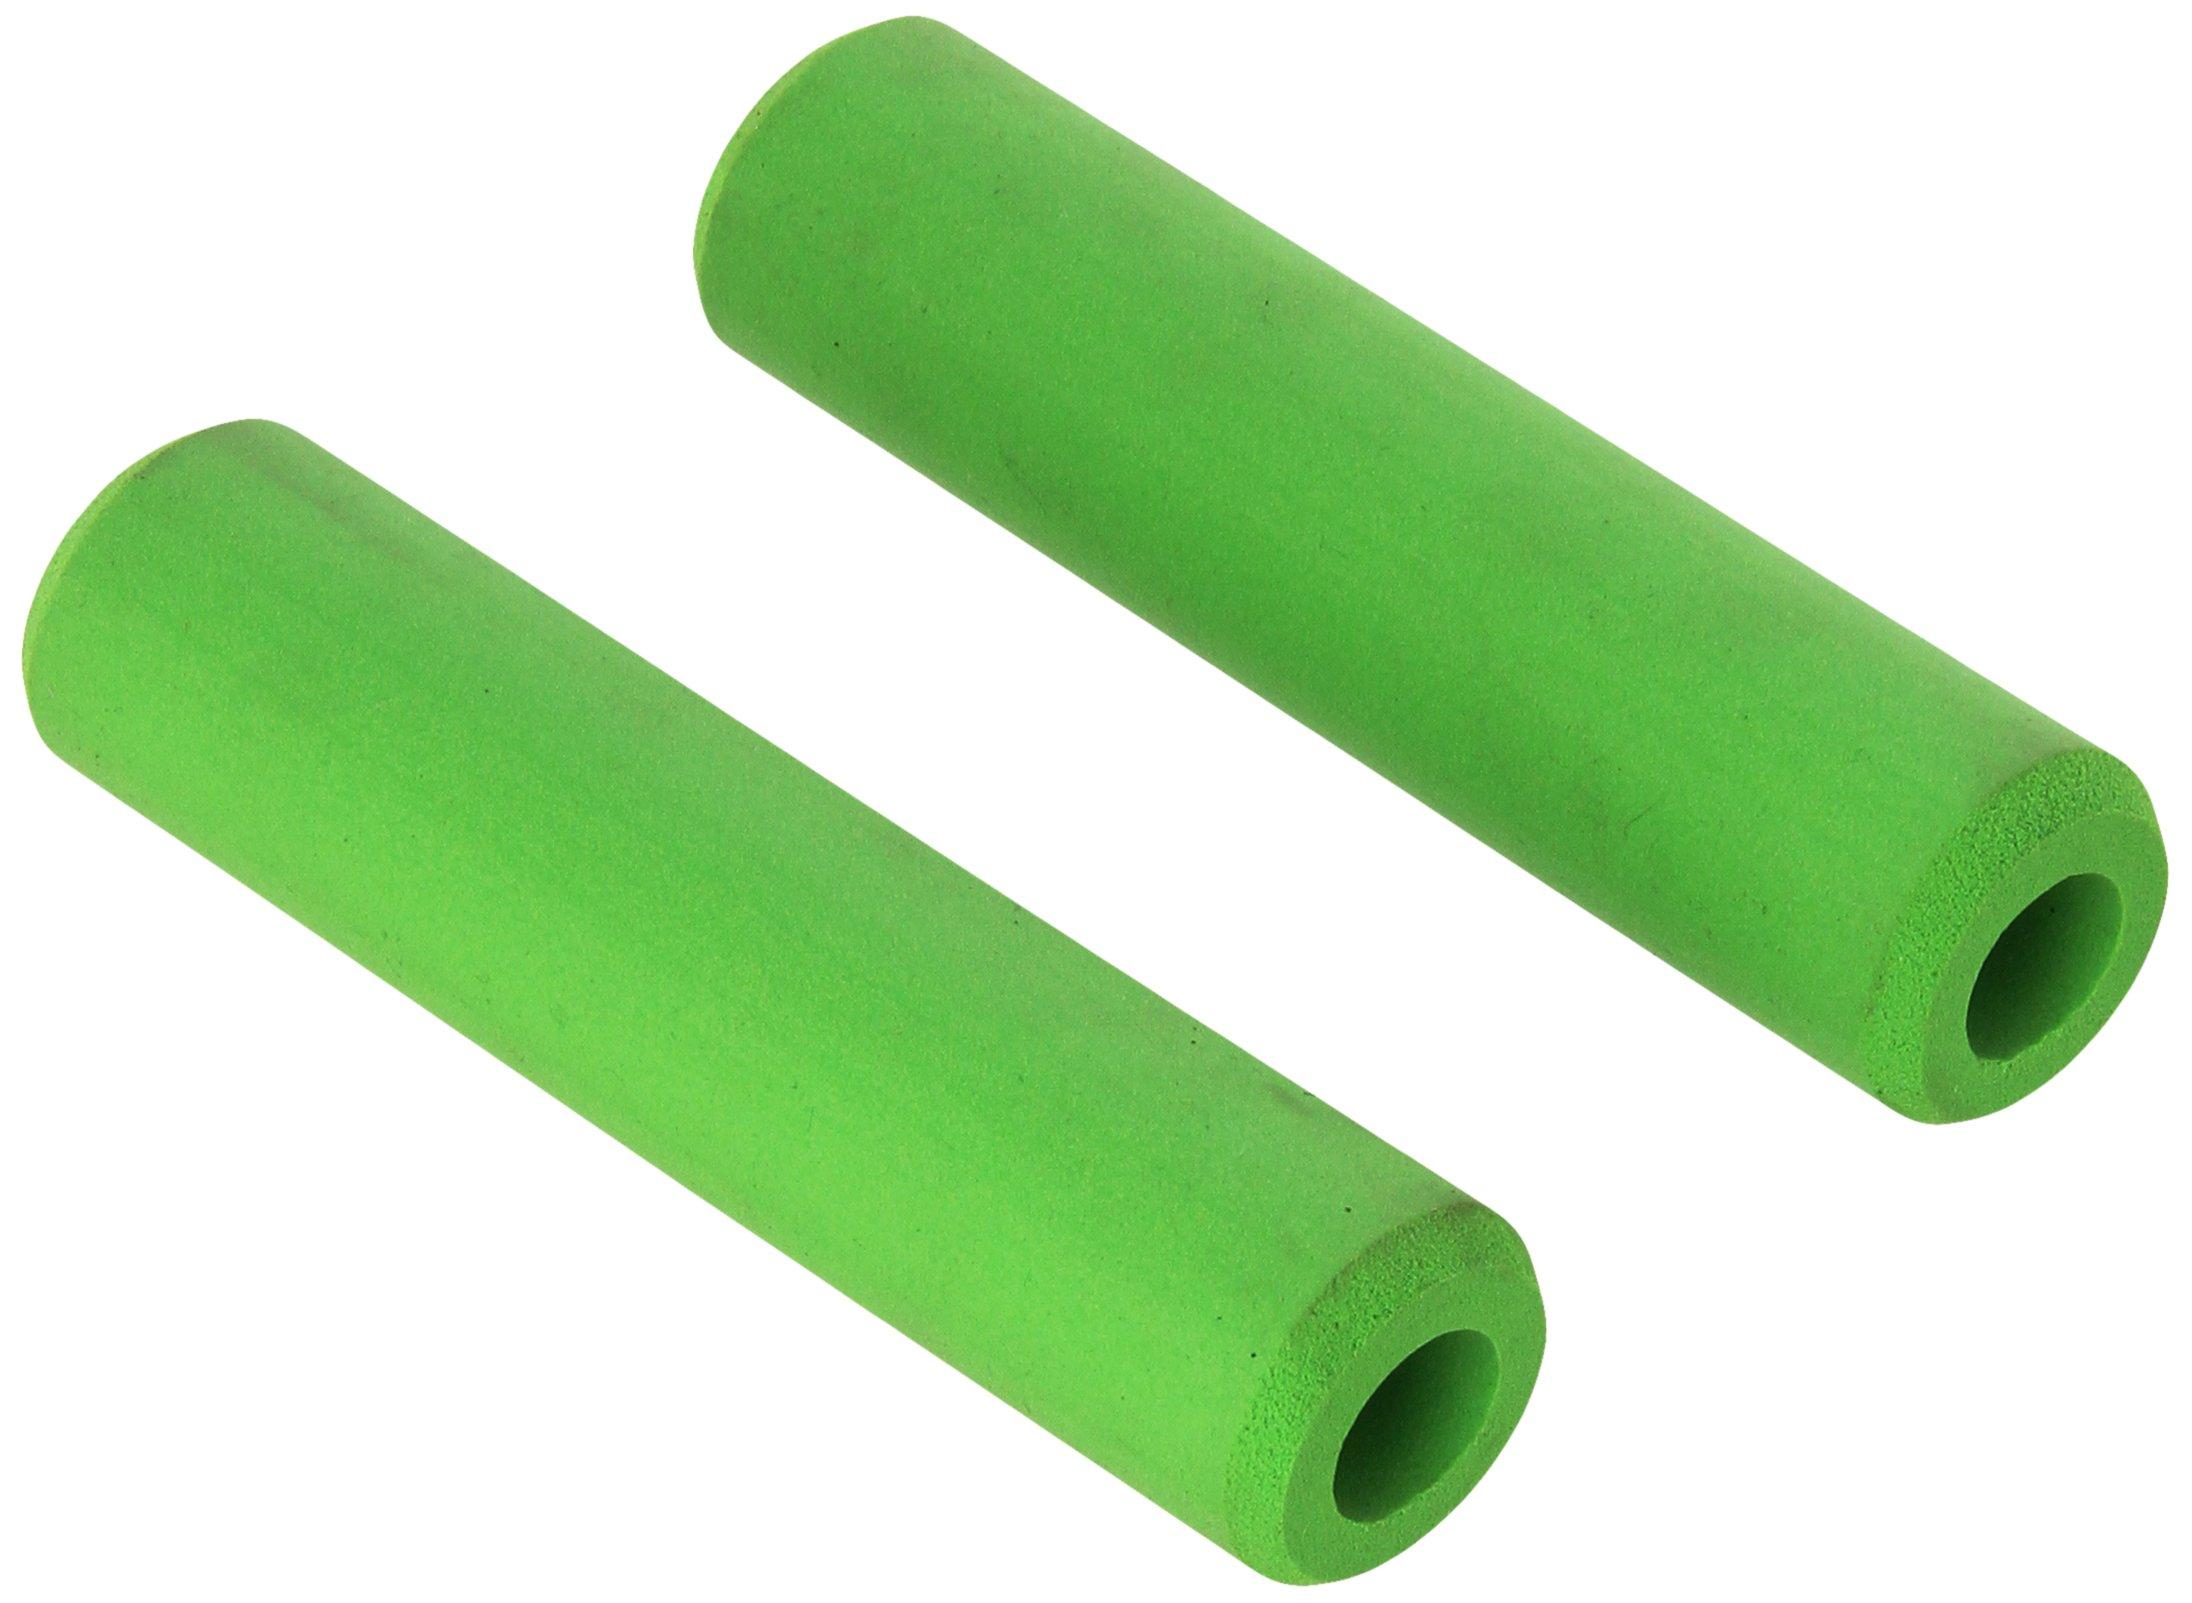 ESI Grips Extra Chunky MTB Grip, Green by ESI Grips